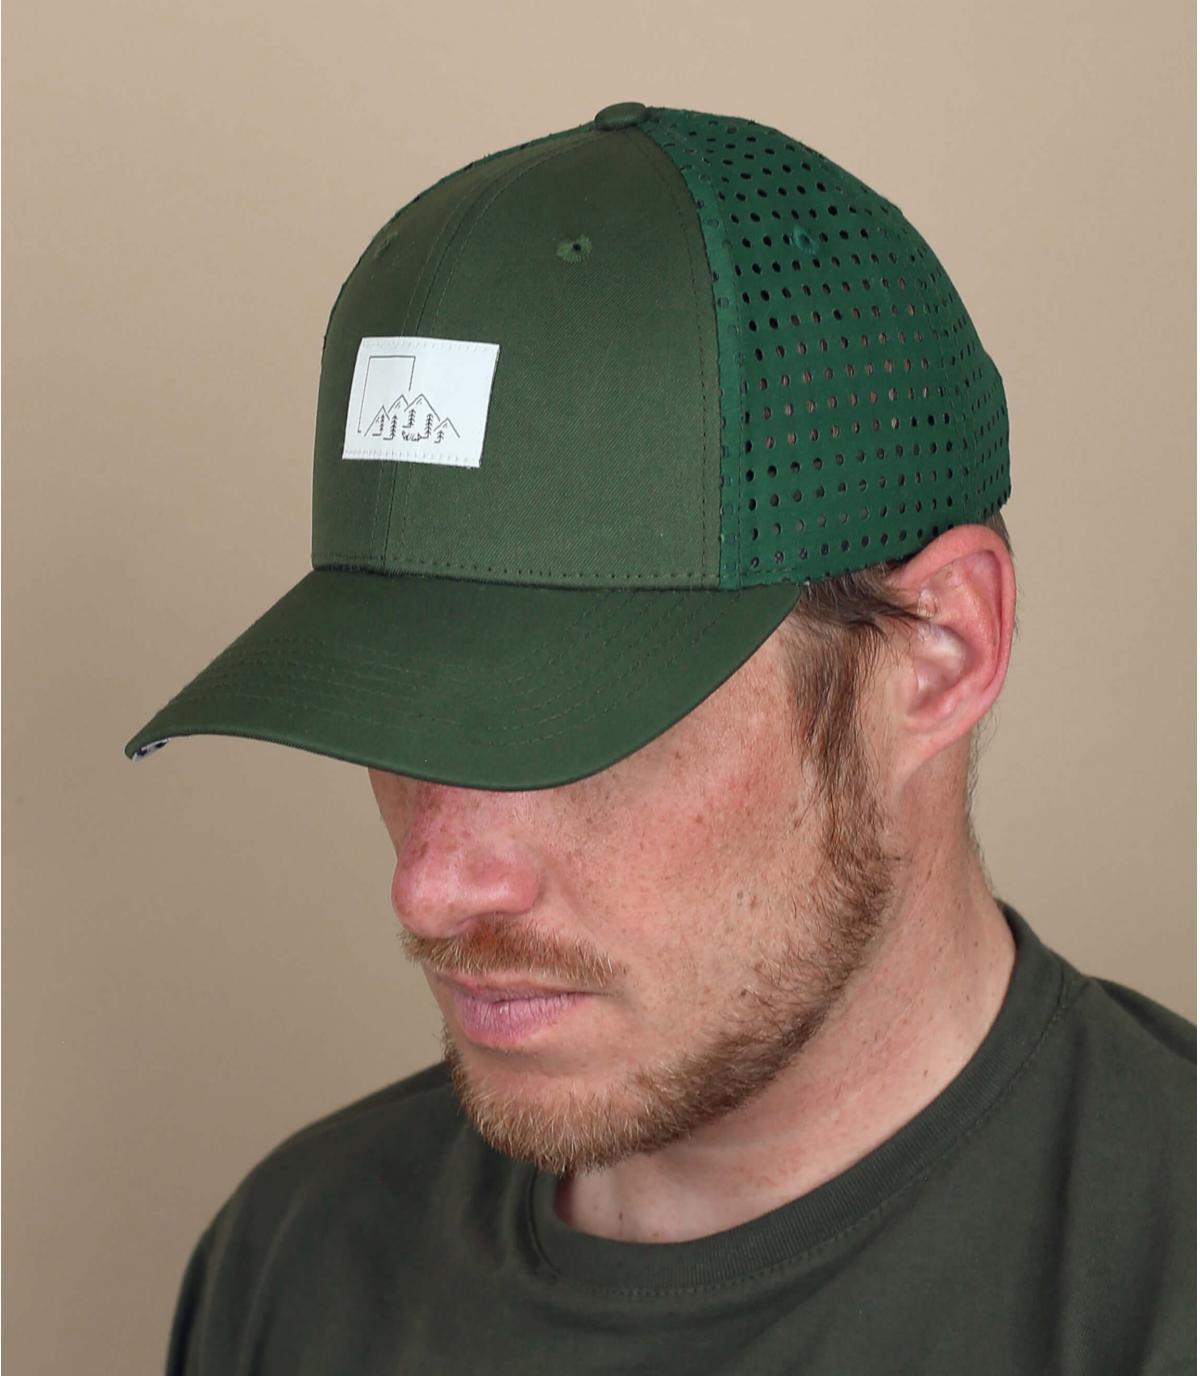 gorra verde NOSC